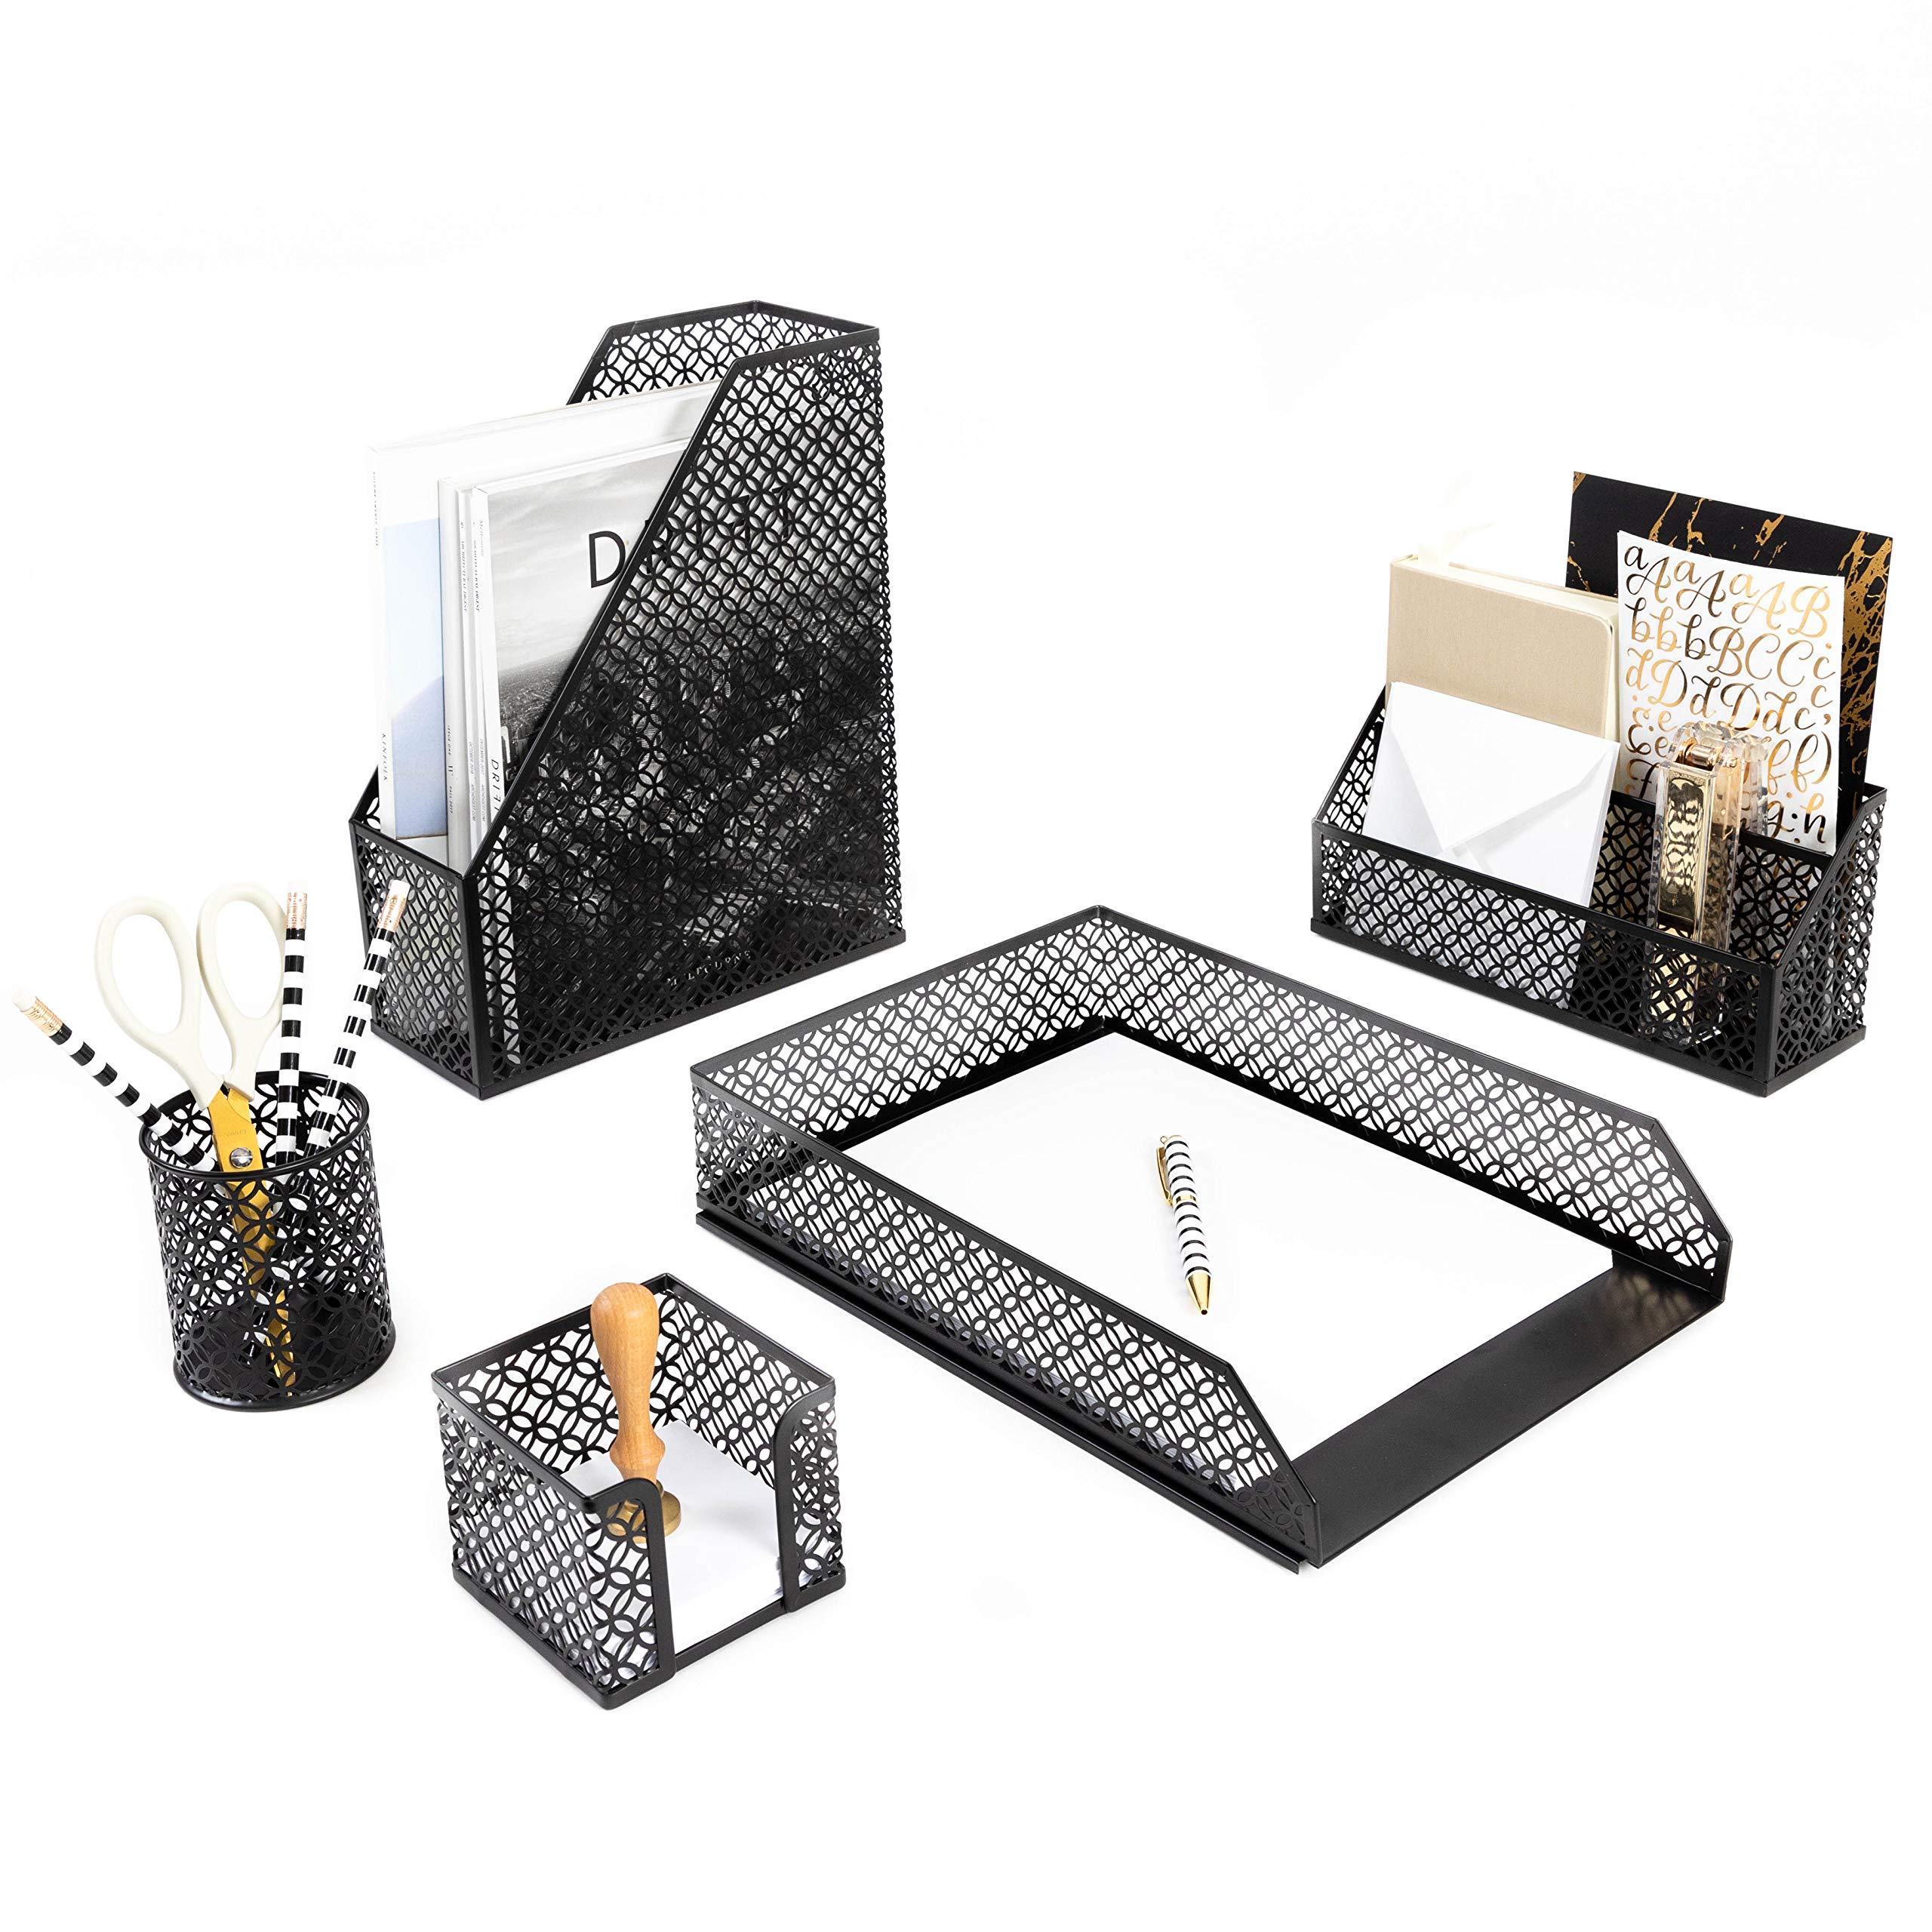 Blu Monaco Black Desk Organizer - 5 Piece Desk Accessories Set - Letter - Mail Organizer, Sticky Note Holder, Pen Cup, Magazine File Holder, Paper - Document Tray - Black